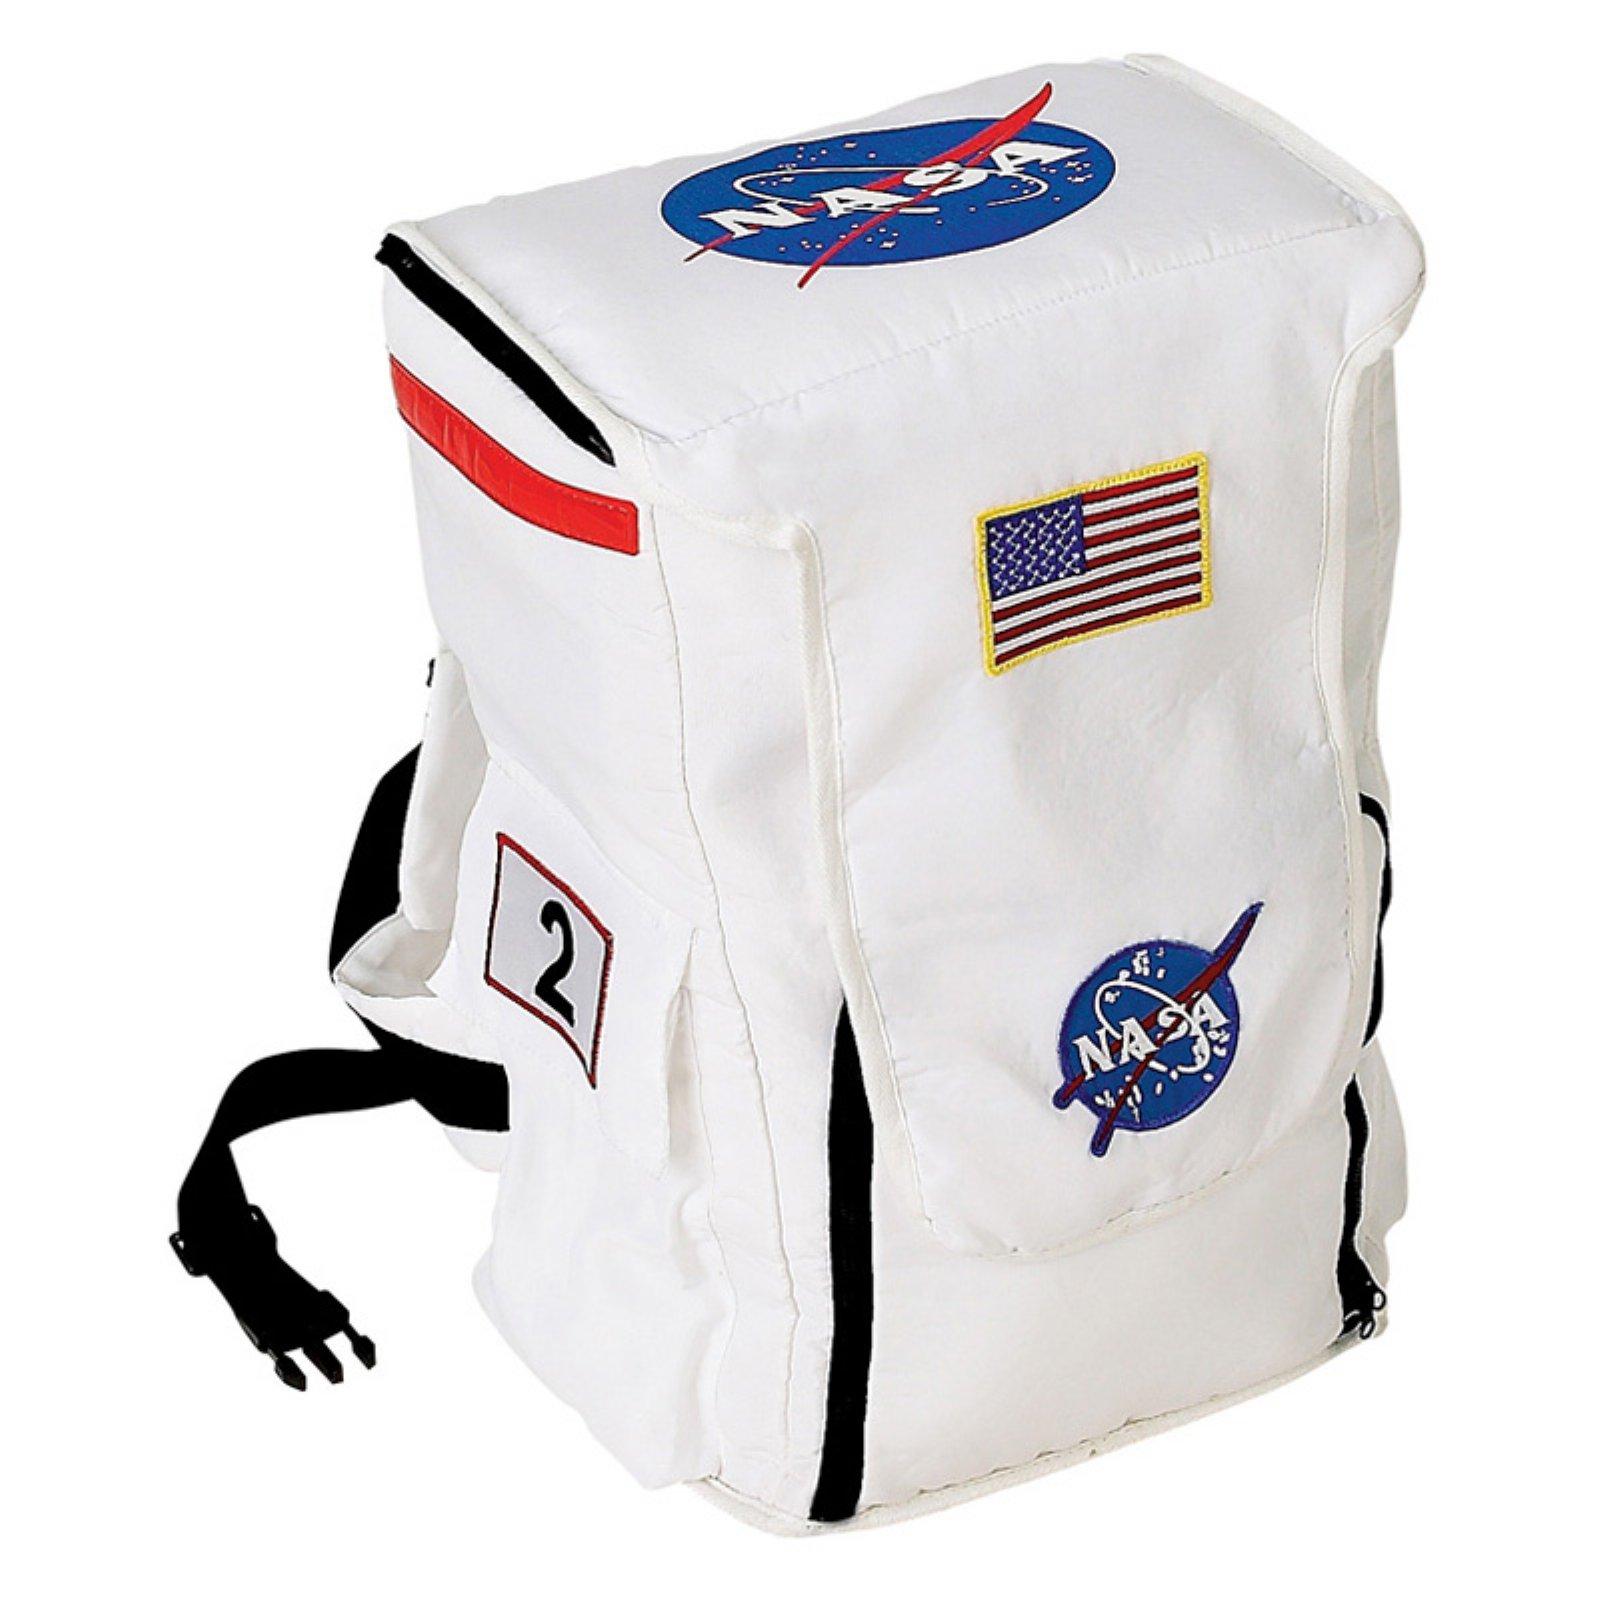 Kid's Astronaut Backpack